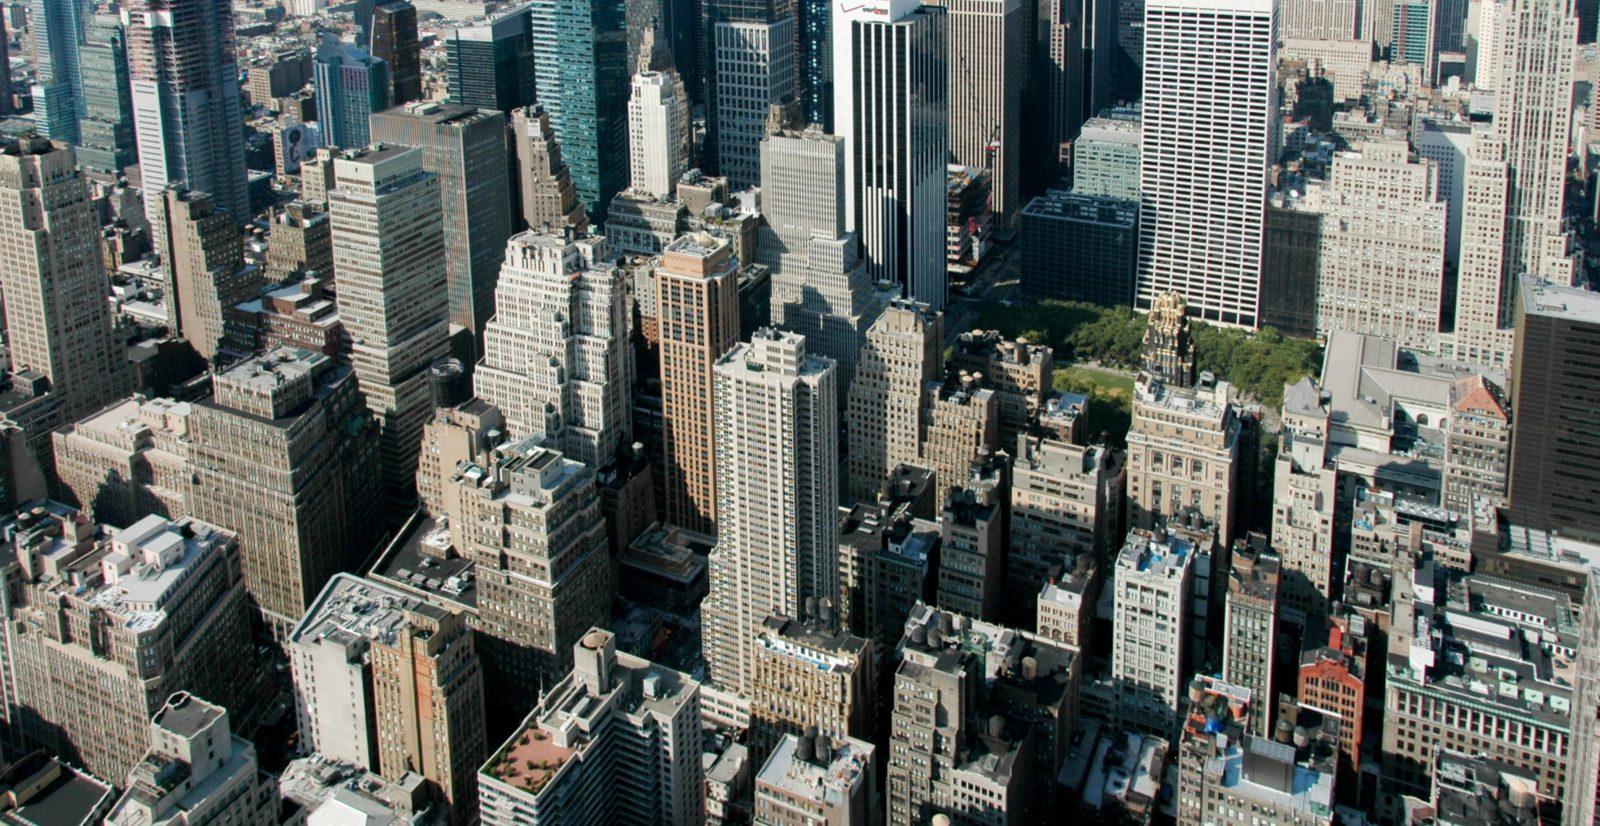 New York Skyscrapers Panoramic View